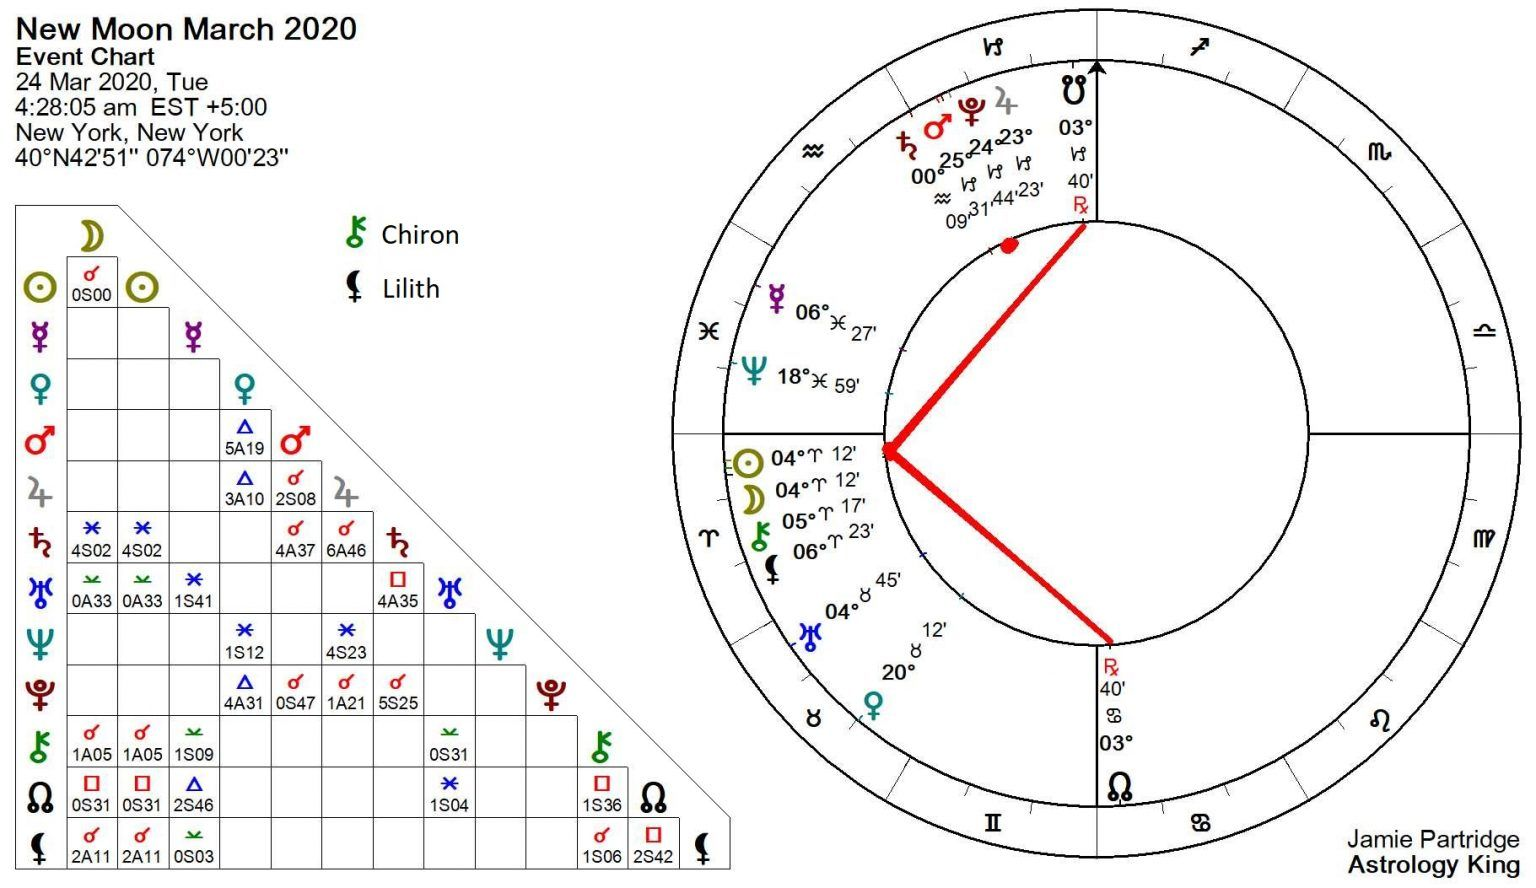 New Moon March 2020 Wounding Healing Horoscope Astrology